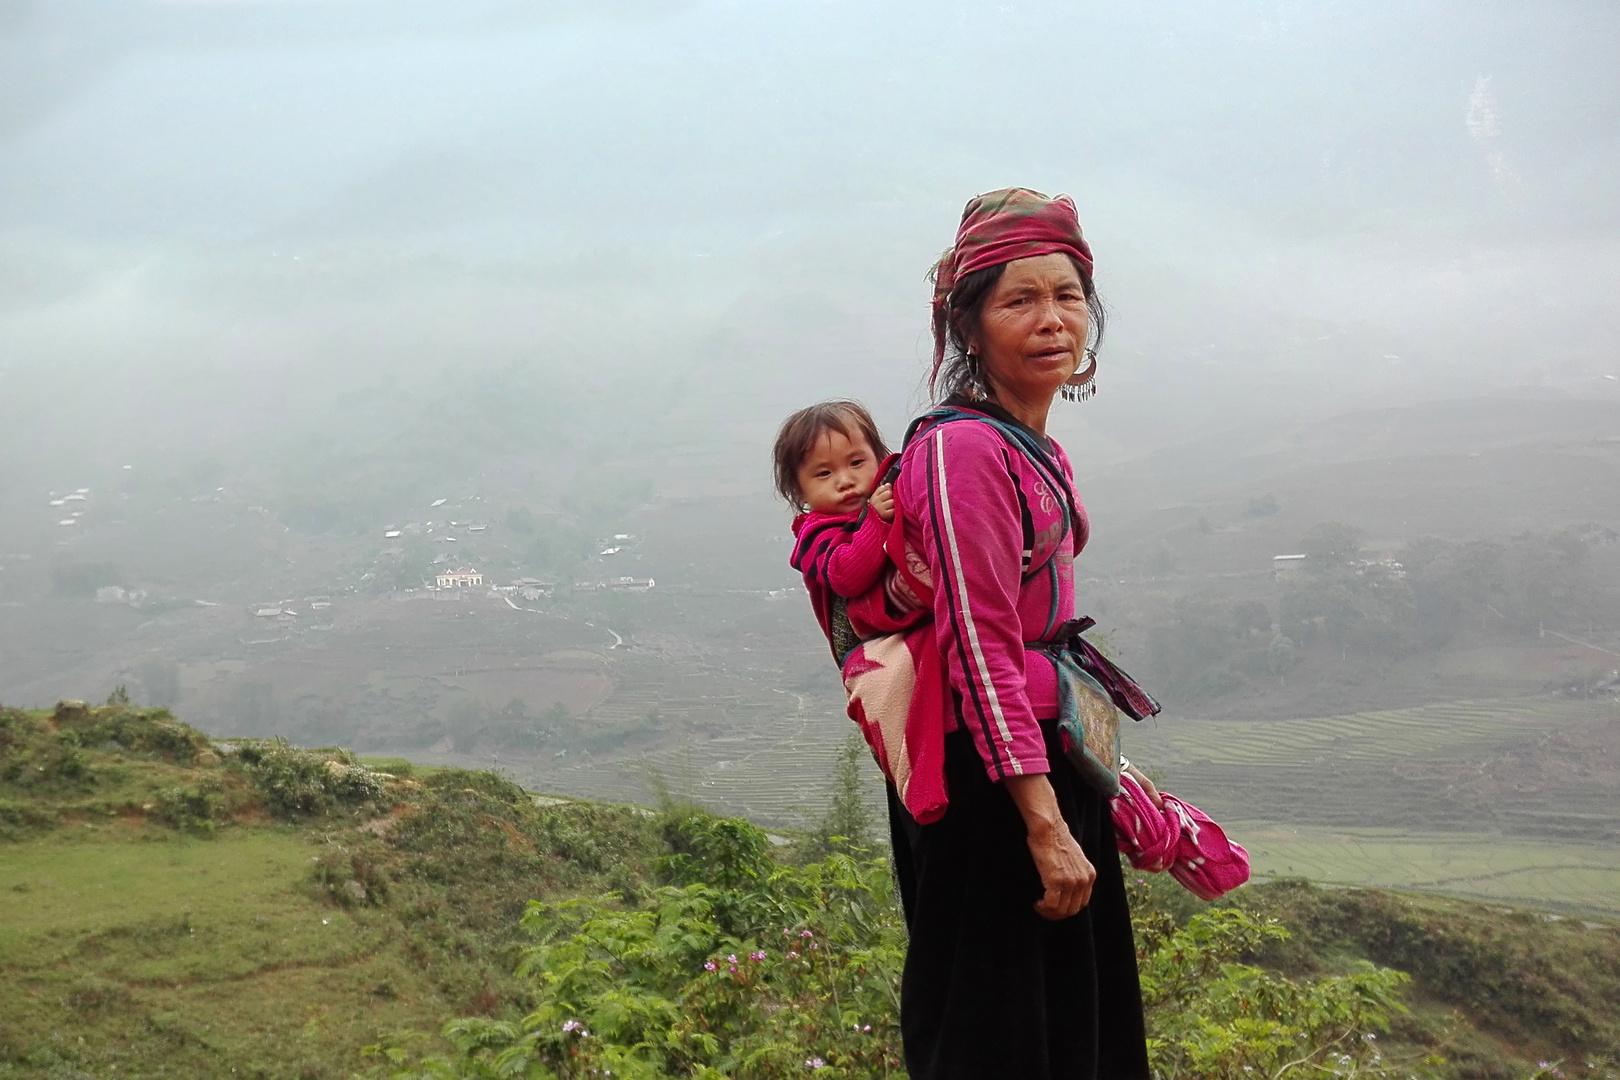 Hmong peasants